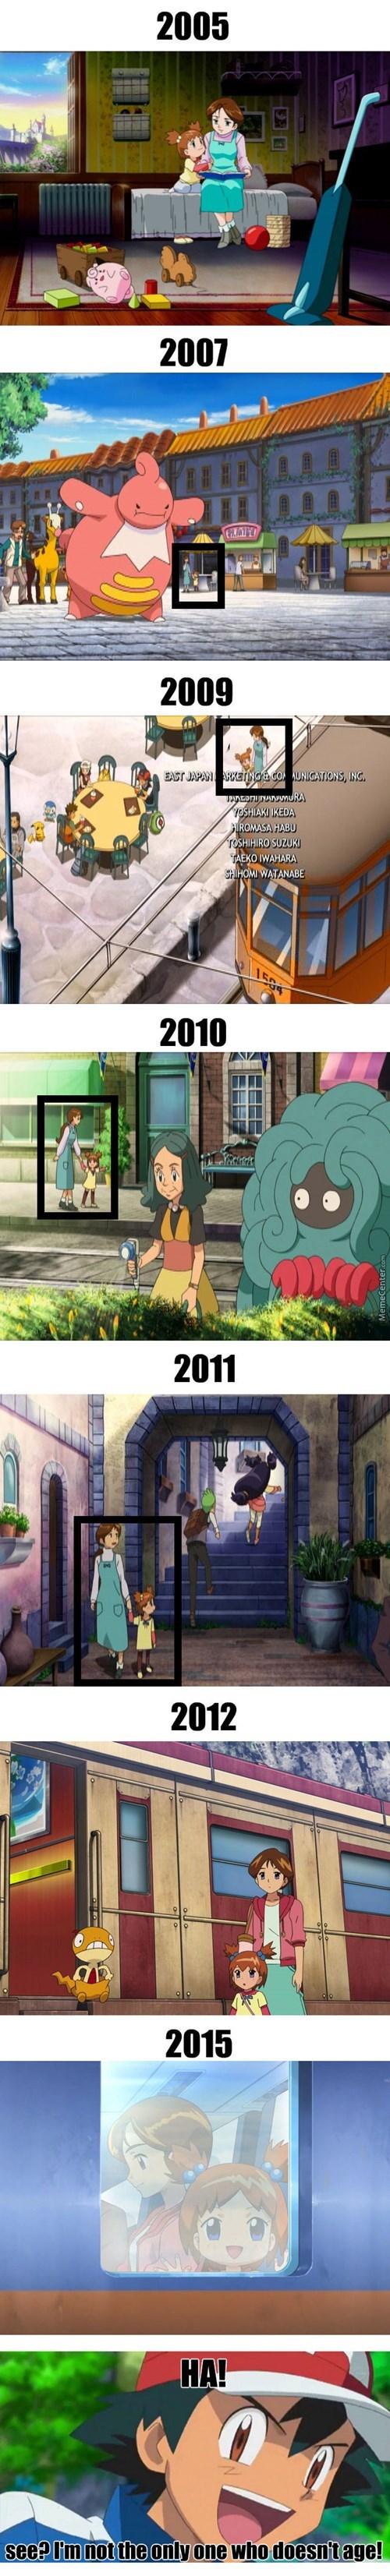 ash ketchum Pokémon anime aging - 8455826688